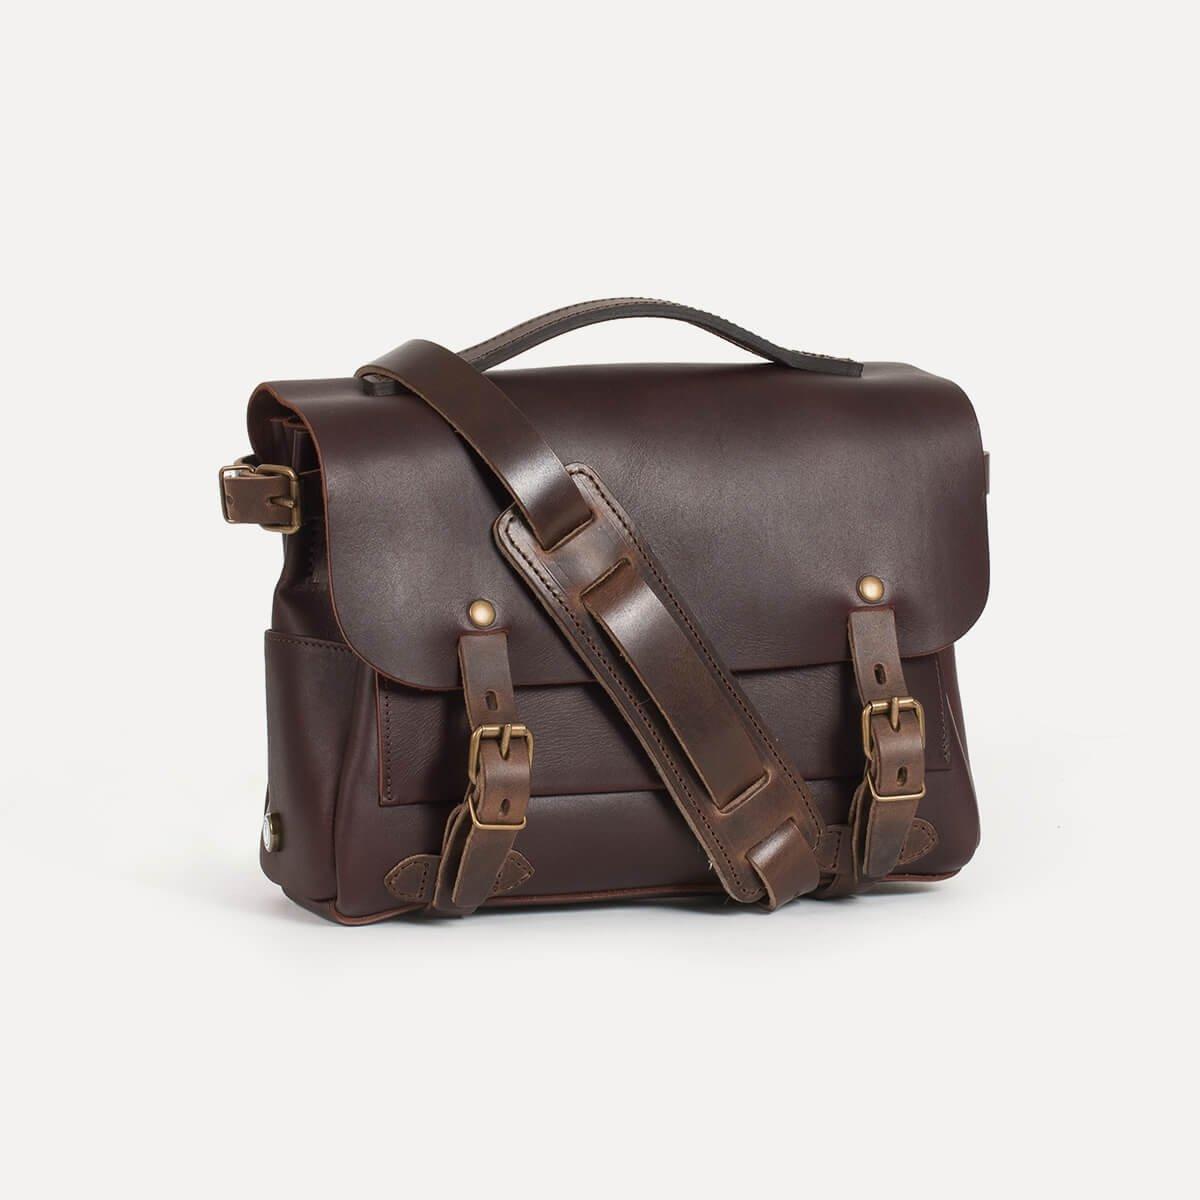 sac postier eclair i sac bedace cuir tann v g tal bleu de chauffe. Black Bedroom Furniture Sets. Home Design Ideas